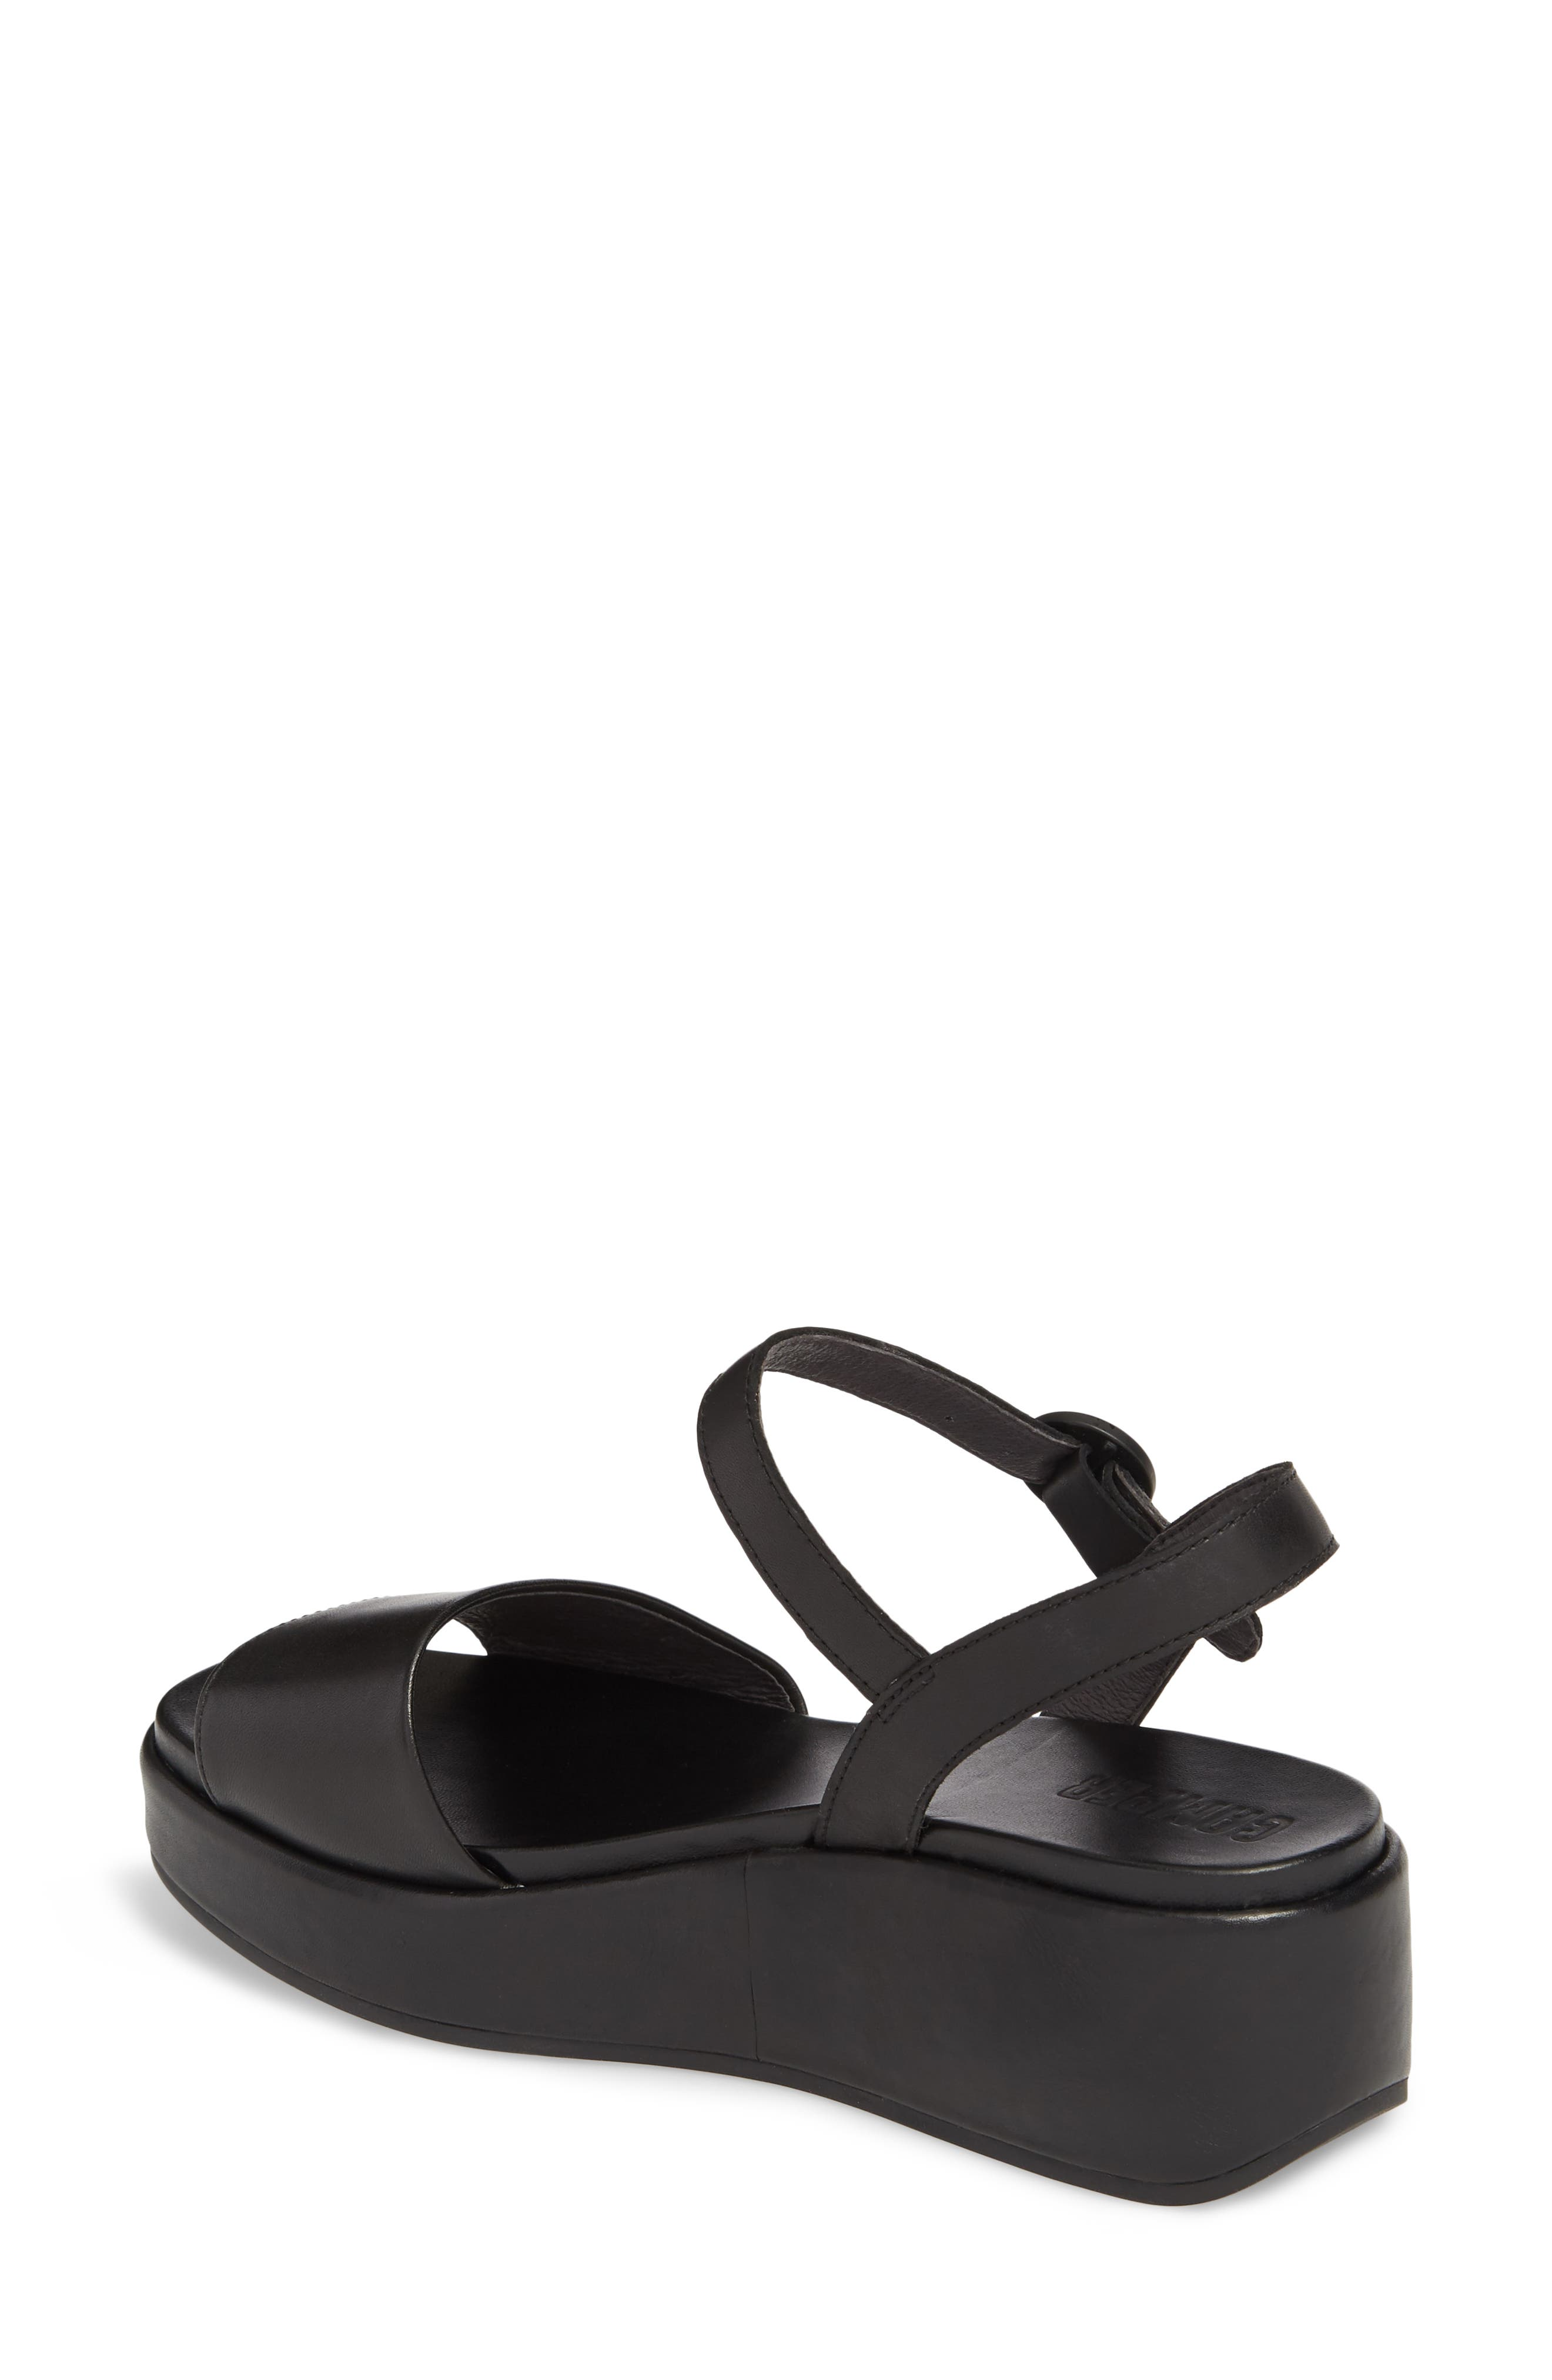 CAMPER, Misia Platform Wedge Sandal, Alternate thumbnail 2, color, BLACK LEATHER